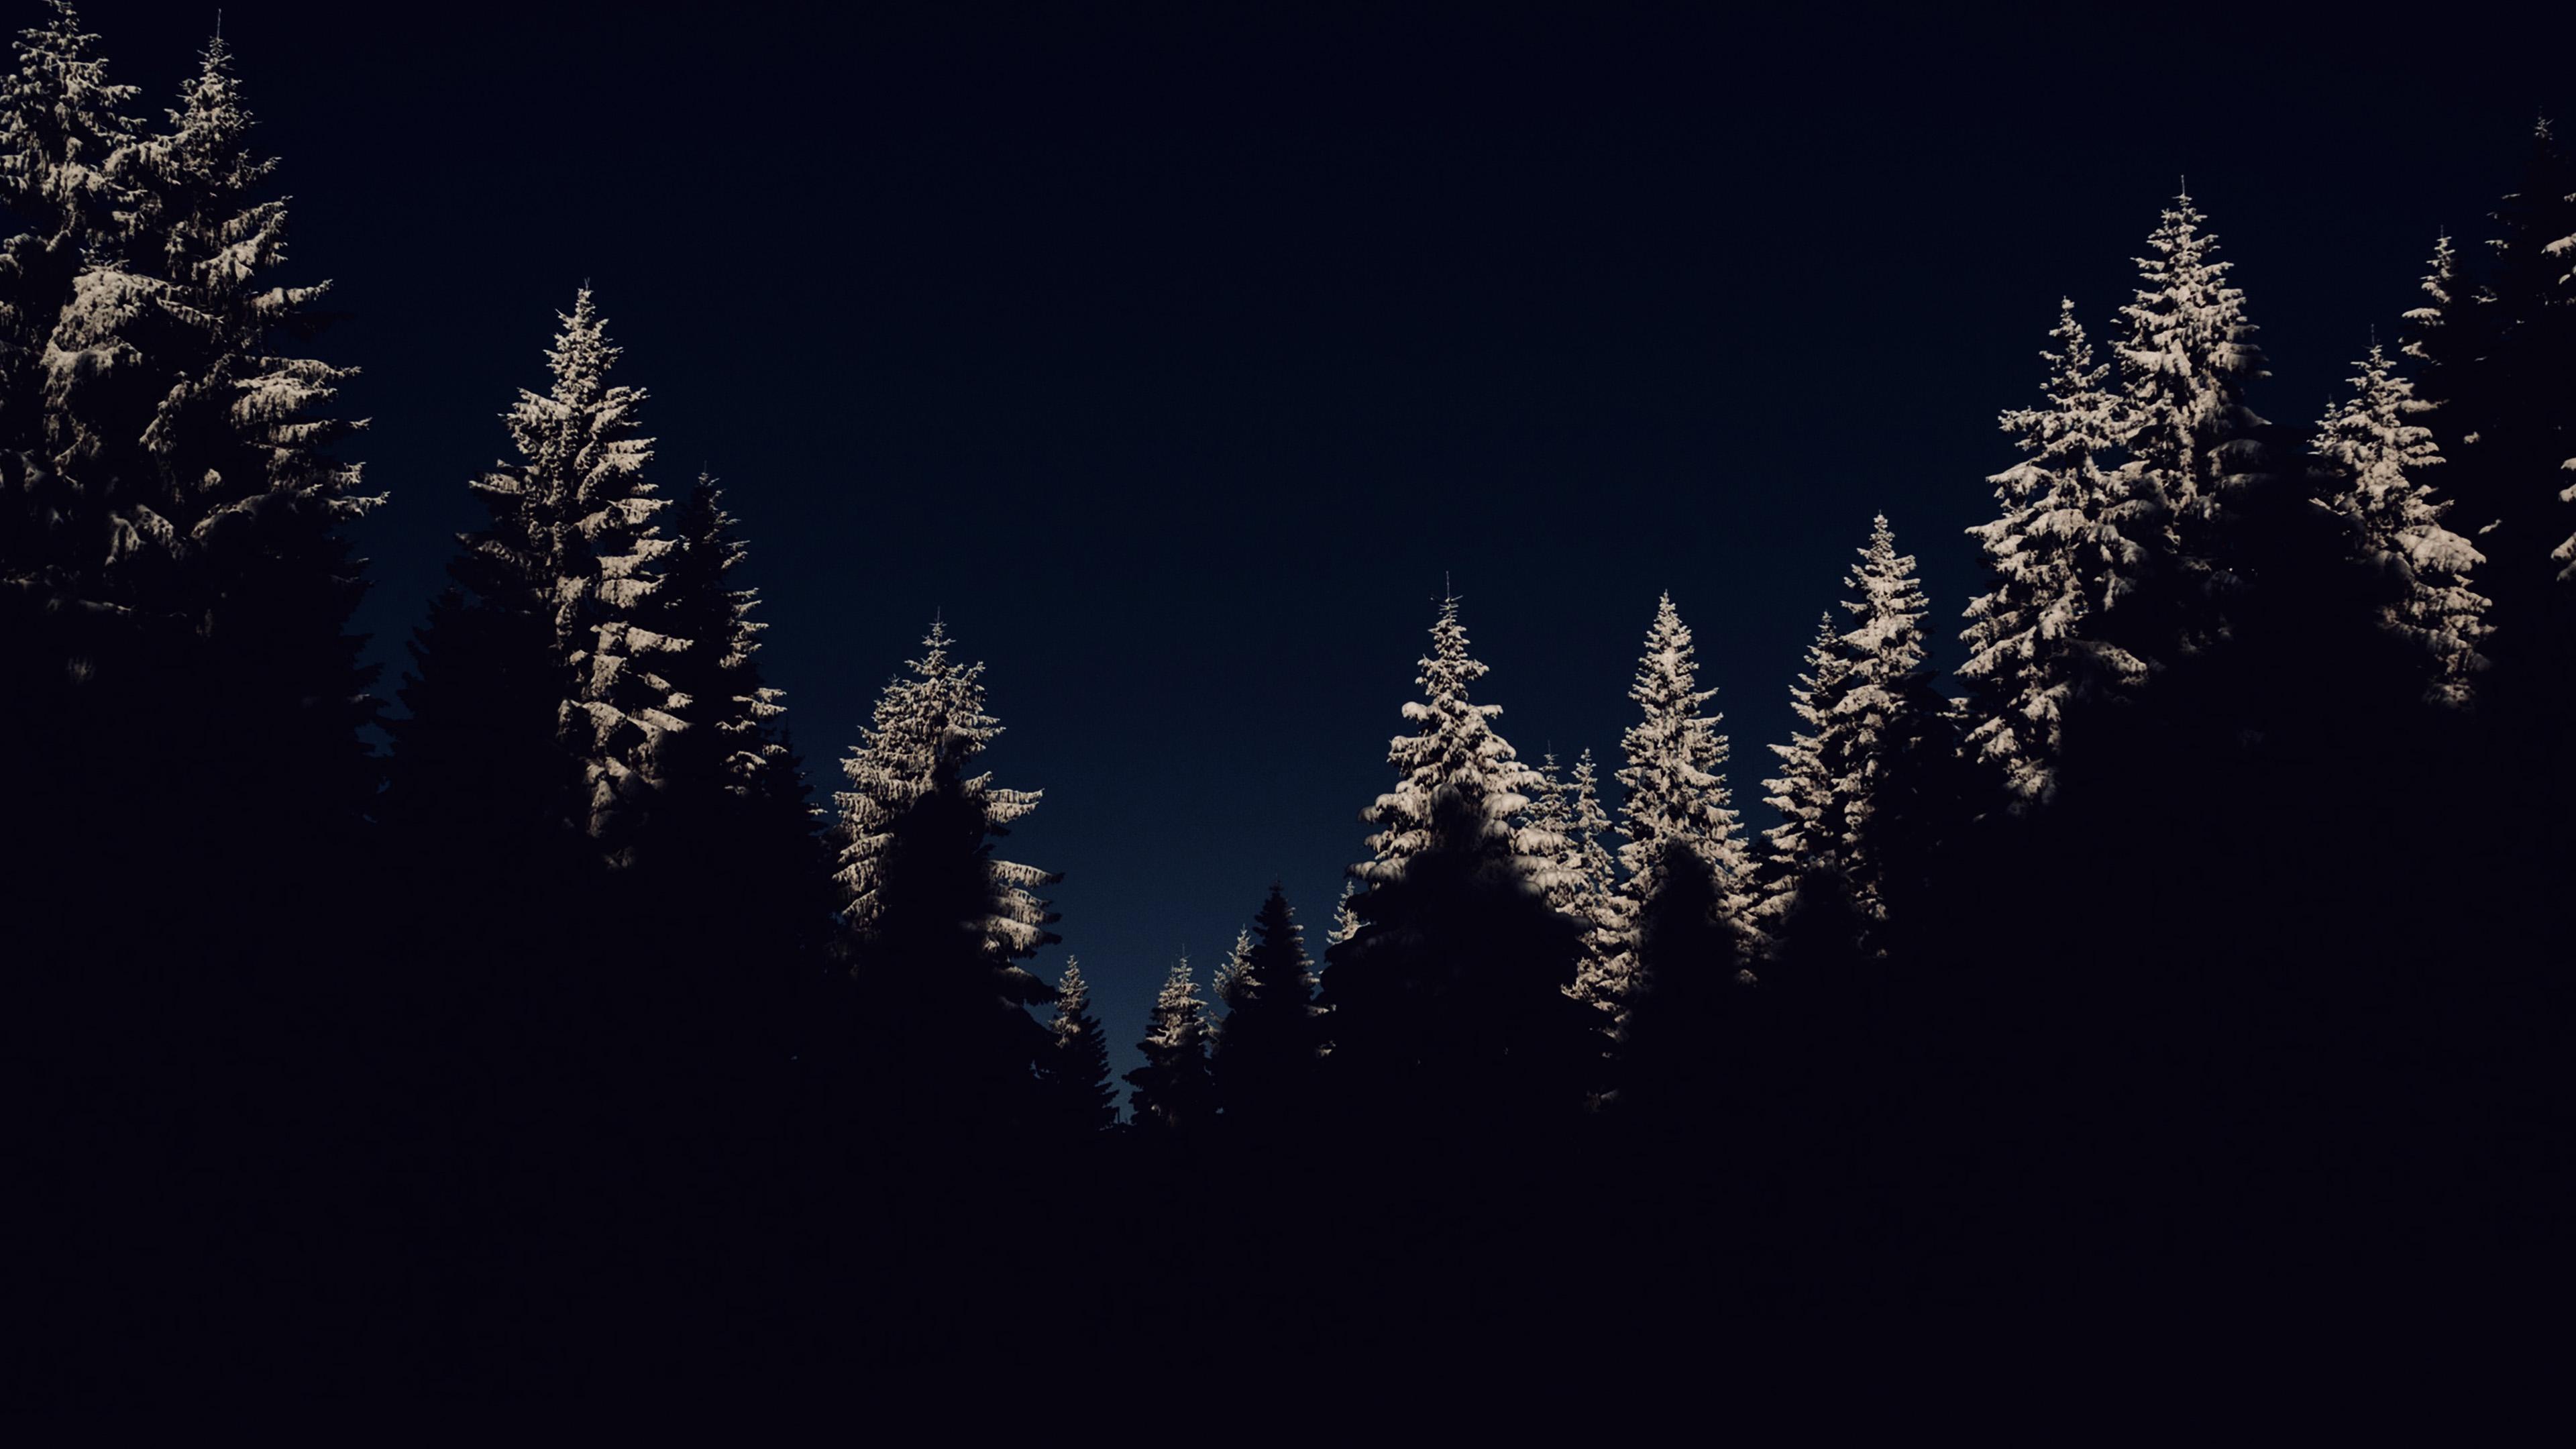 Fall Iphone 7 Plus Wallpaper Nl45 Wood Winter Night Mountain Dark Wallpaper